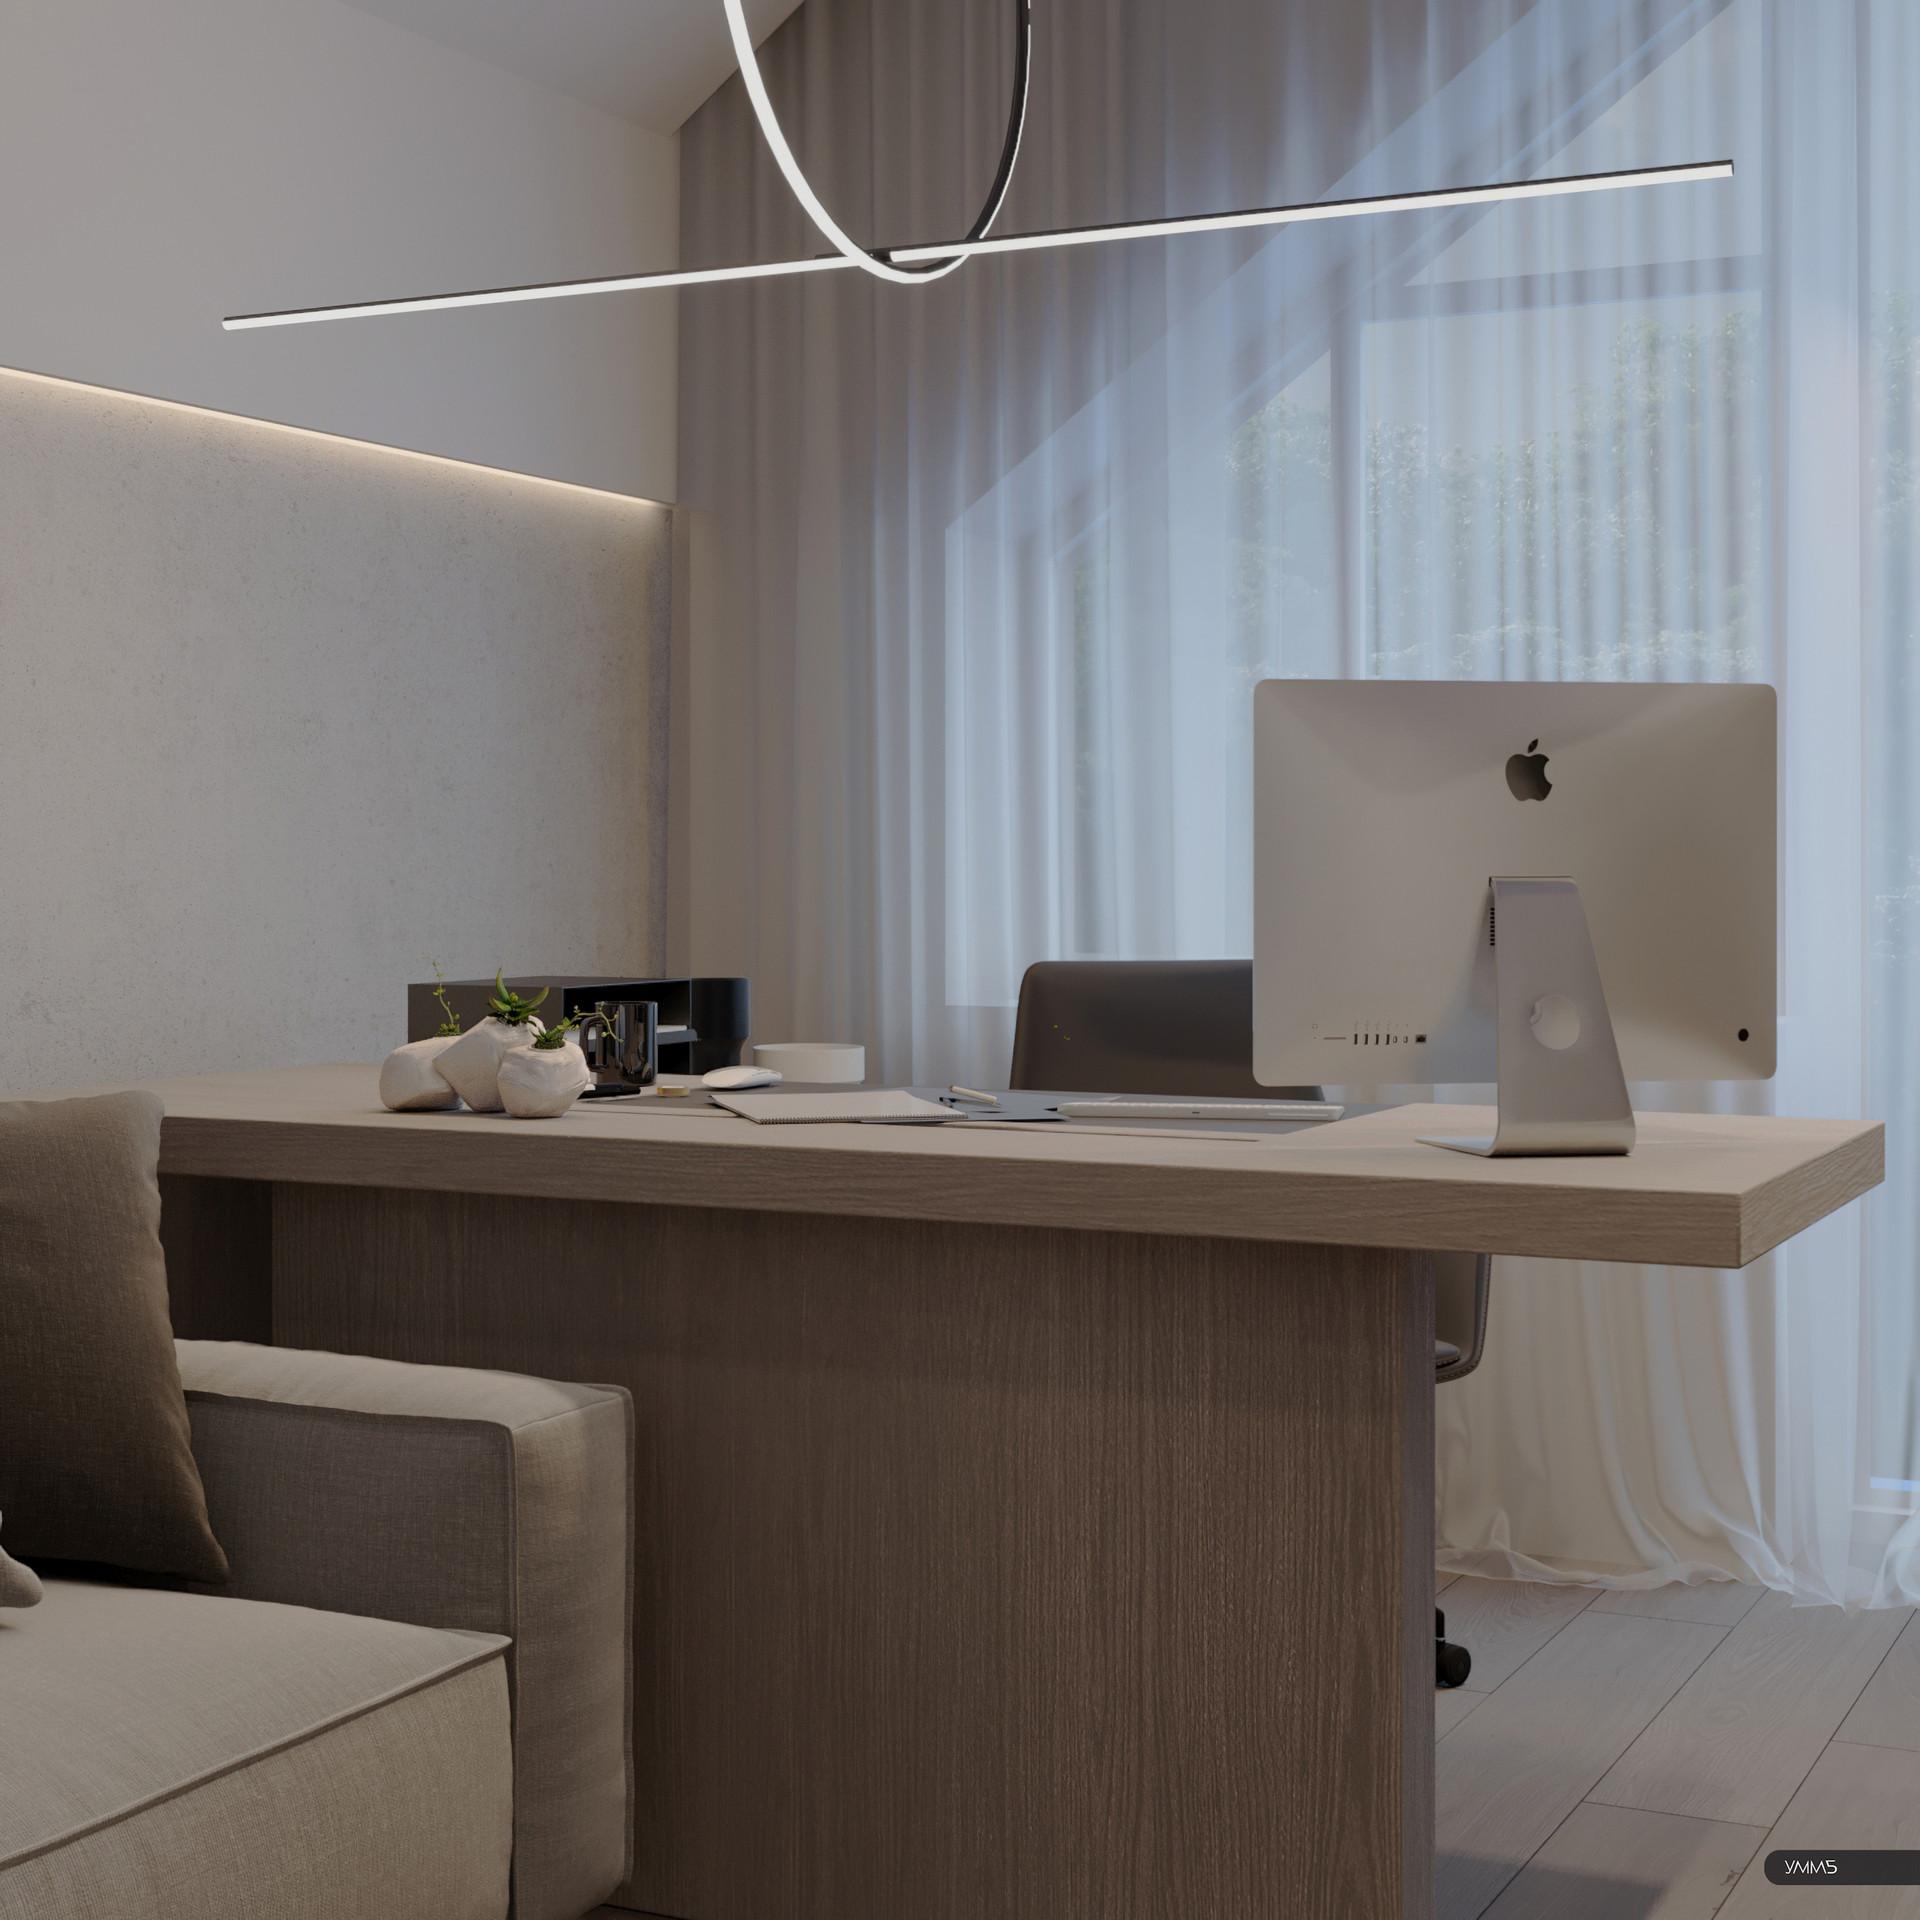 Современный дизайн, современный интерьер, дизайн квартиры, дизайн калининград, дизайнеры калининграда, интерьер калининград, дизайн проект квартиры, дизайн студии, дизайн интерьера калининград, дизайнер интерьера калининград, кабинет интерьер, дизайн кабинета, кабинет. современный дизайн кабинет, современный интерьер кабинета, современный интерьер, современный дизайн, дизайн интерьера, дизайн, интерьер, дизайн интерьера калининград, калининград, умм5, umm5, modern interior, modern wardrobe, design interior, interior design